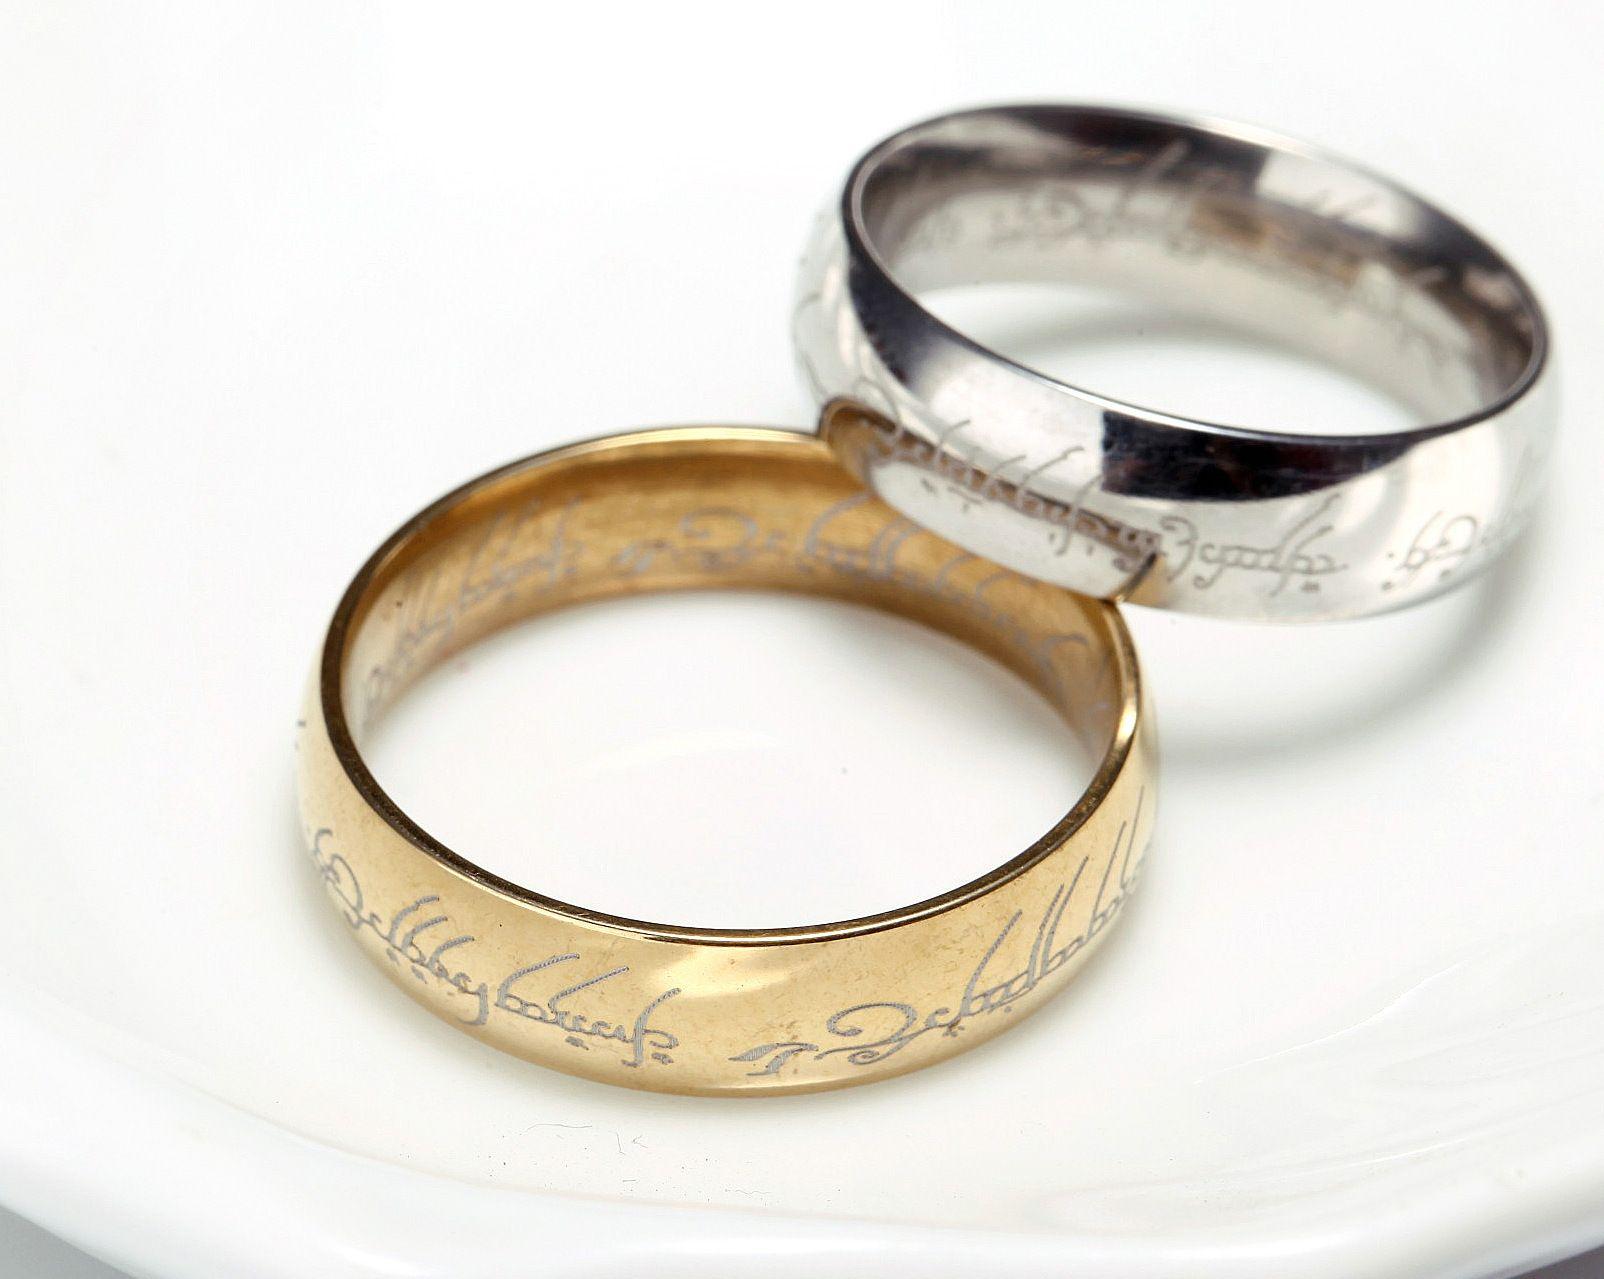 DFWX Standard Christian Wedding Ceremony